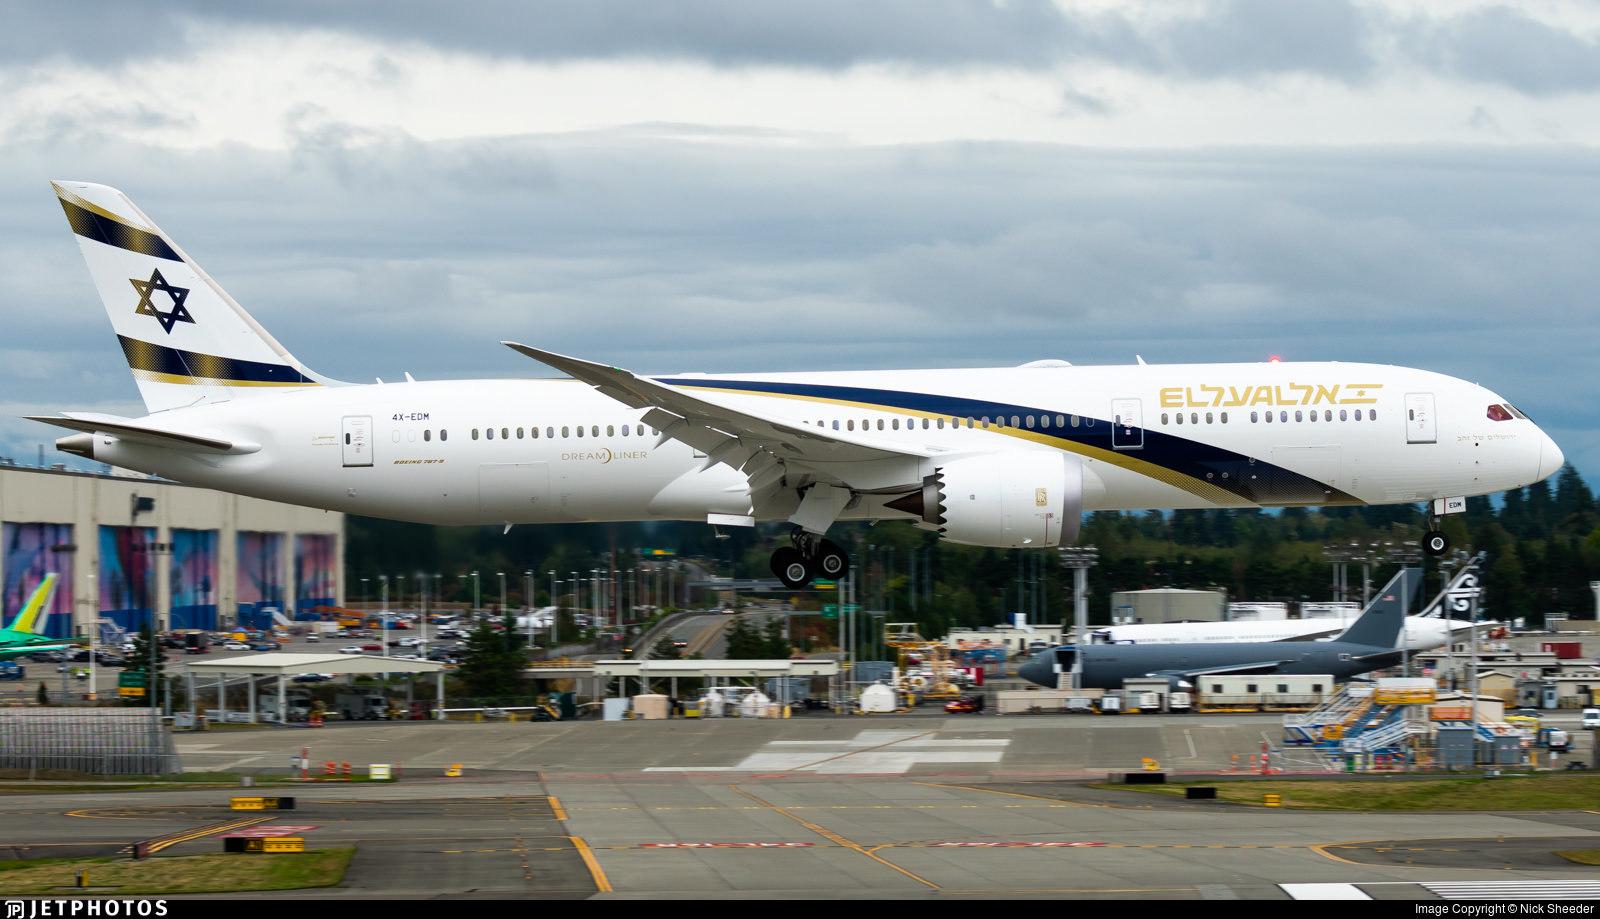 El Al's 'Jerusalem of Gold' livery 787